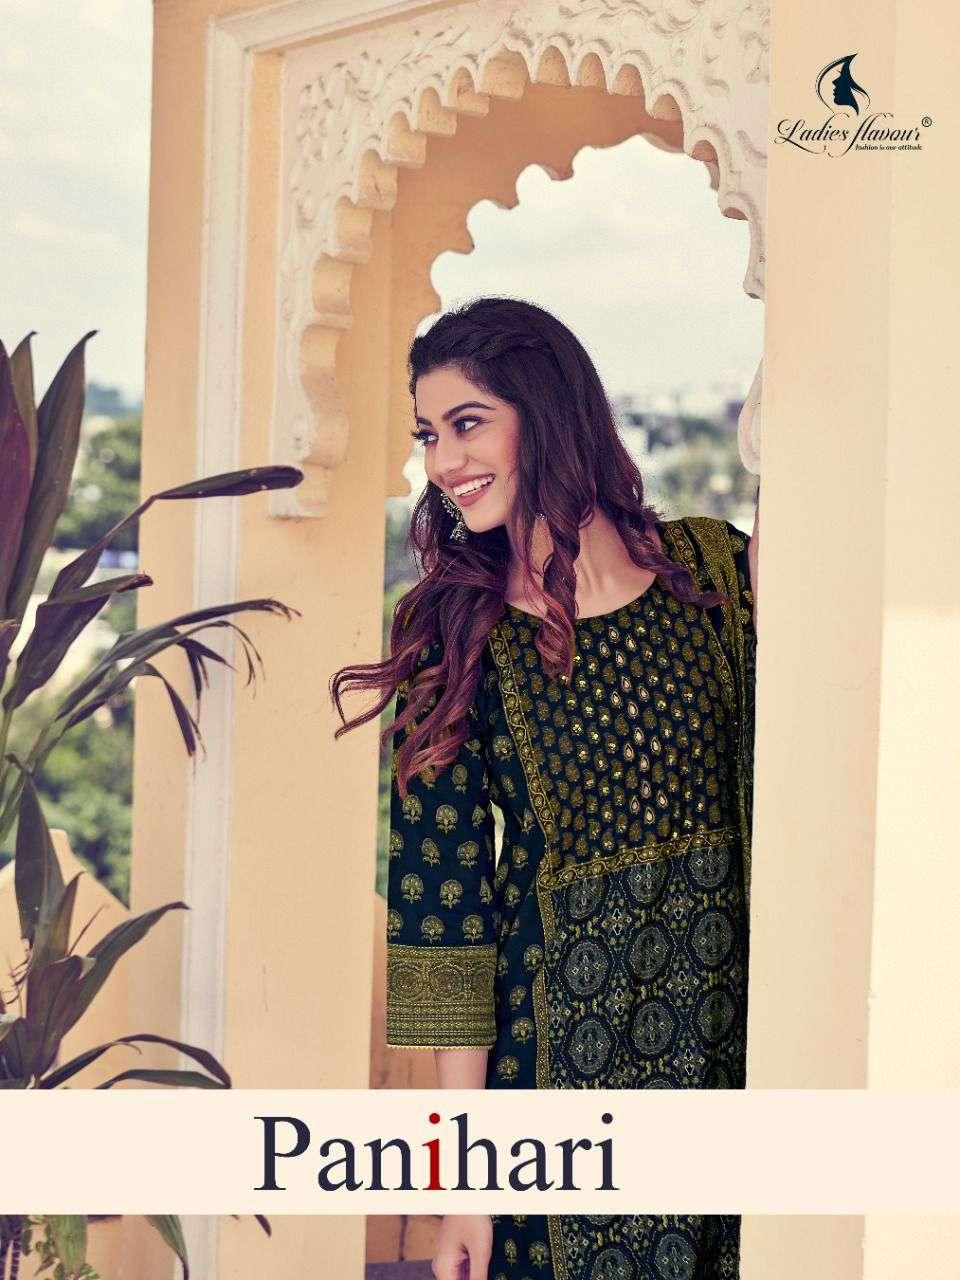 Ladies Flavour Panihari Modal Chanderi Print With Khatli work Kurtis With pant With Dupatta collection